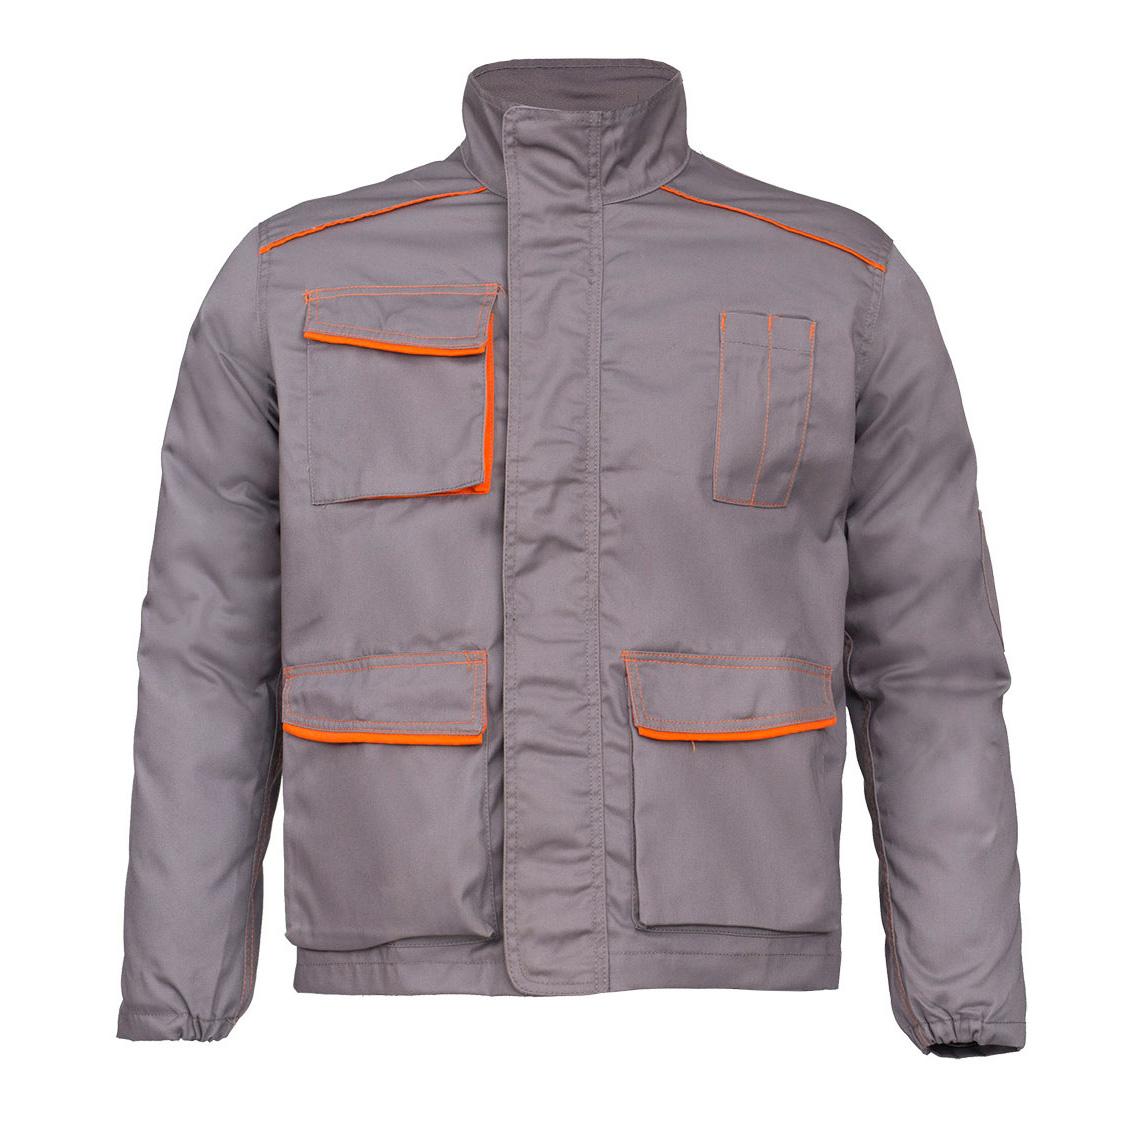 Radna jakna ATLANTIC siva